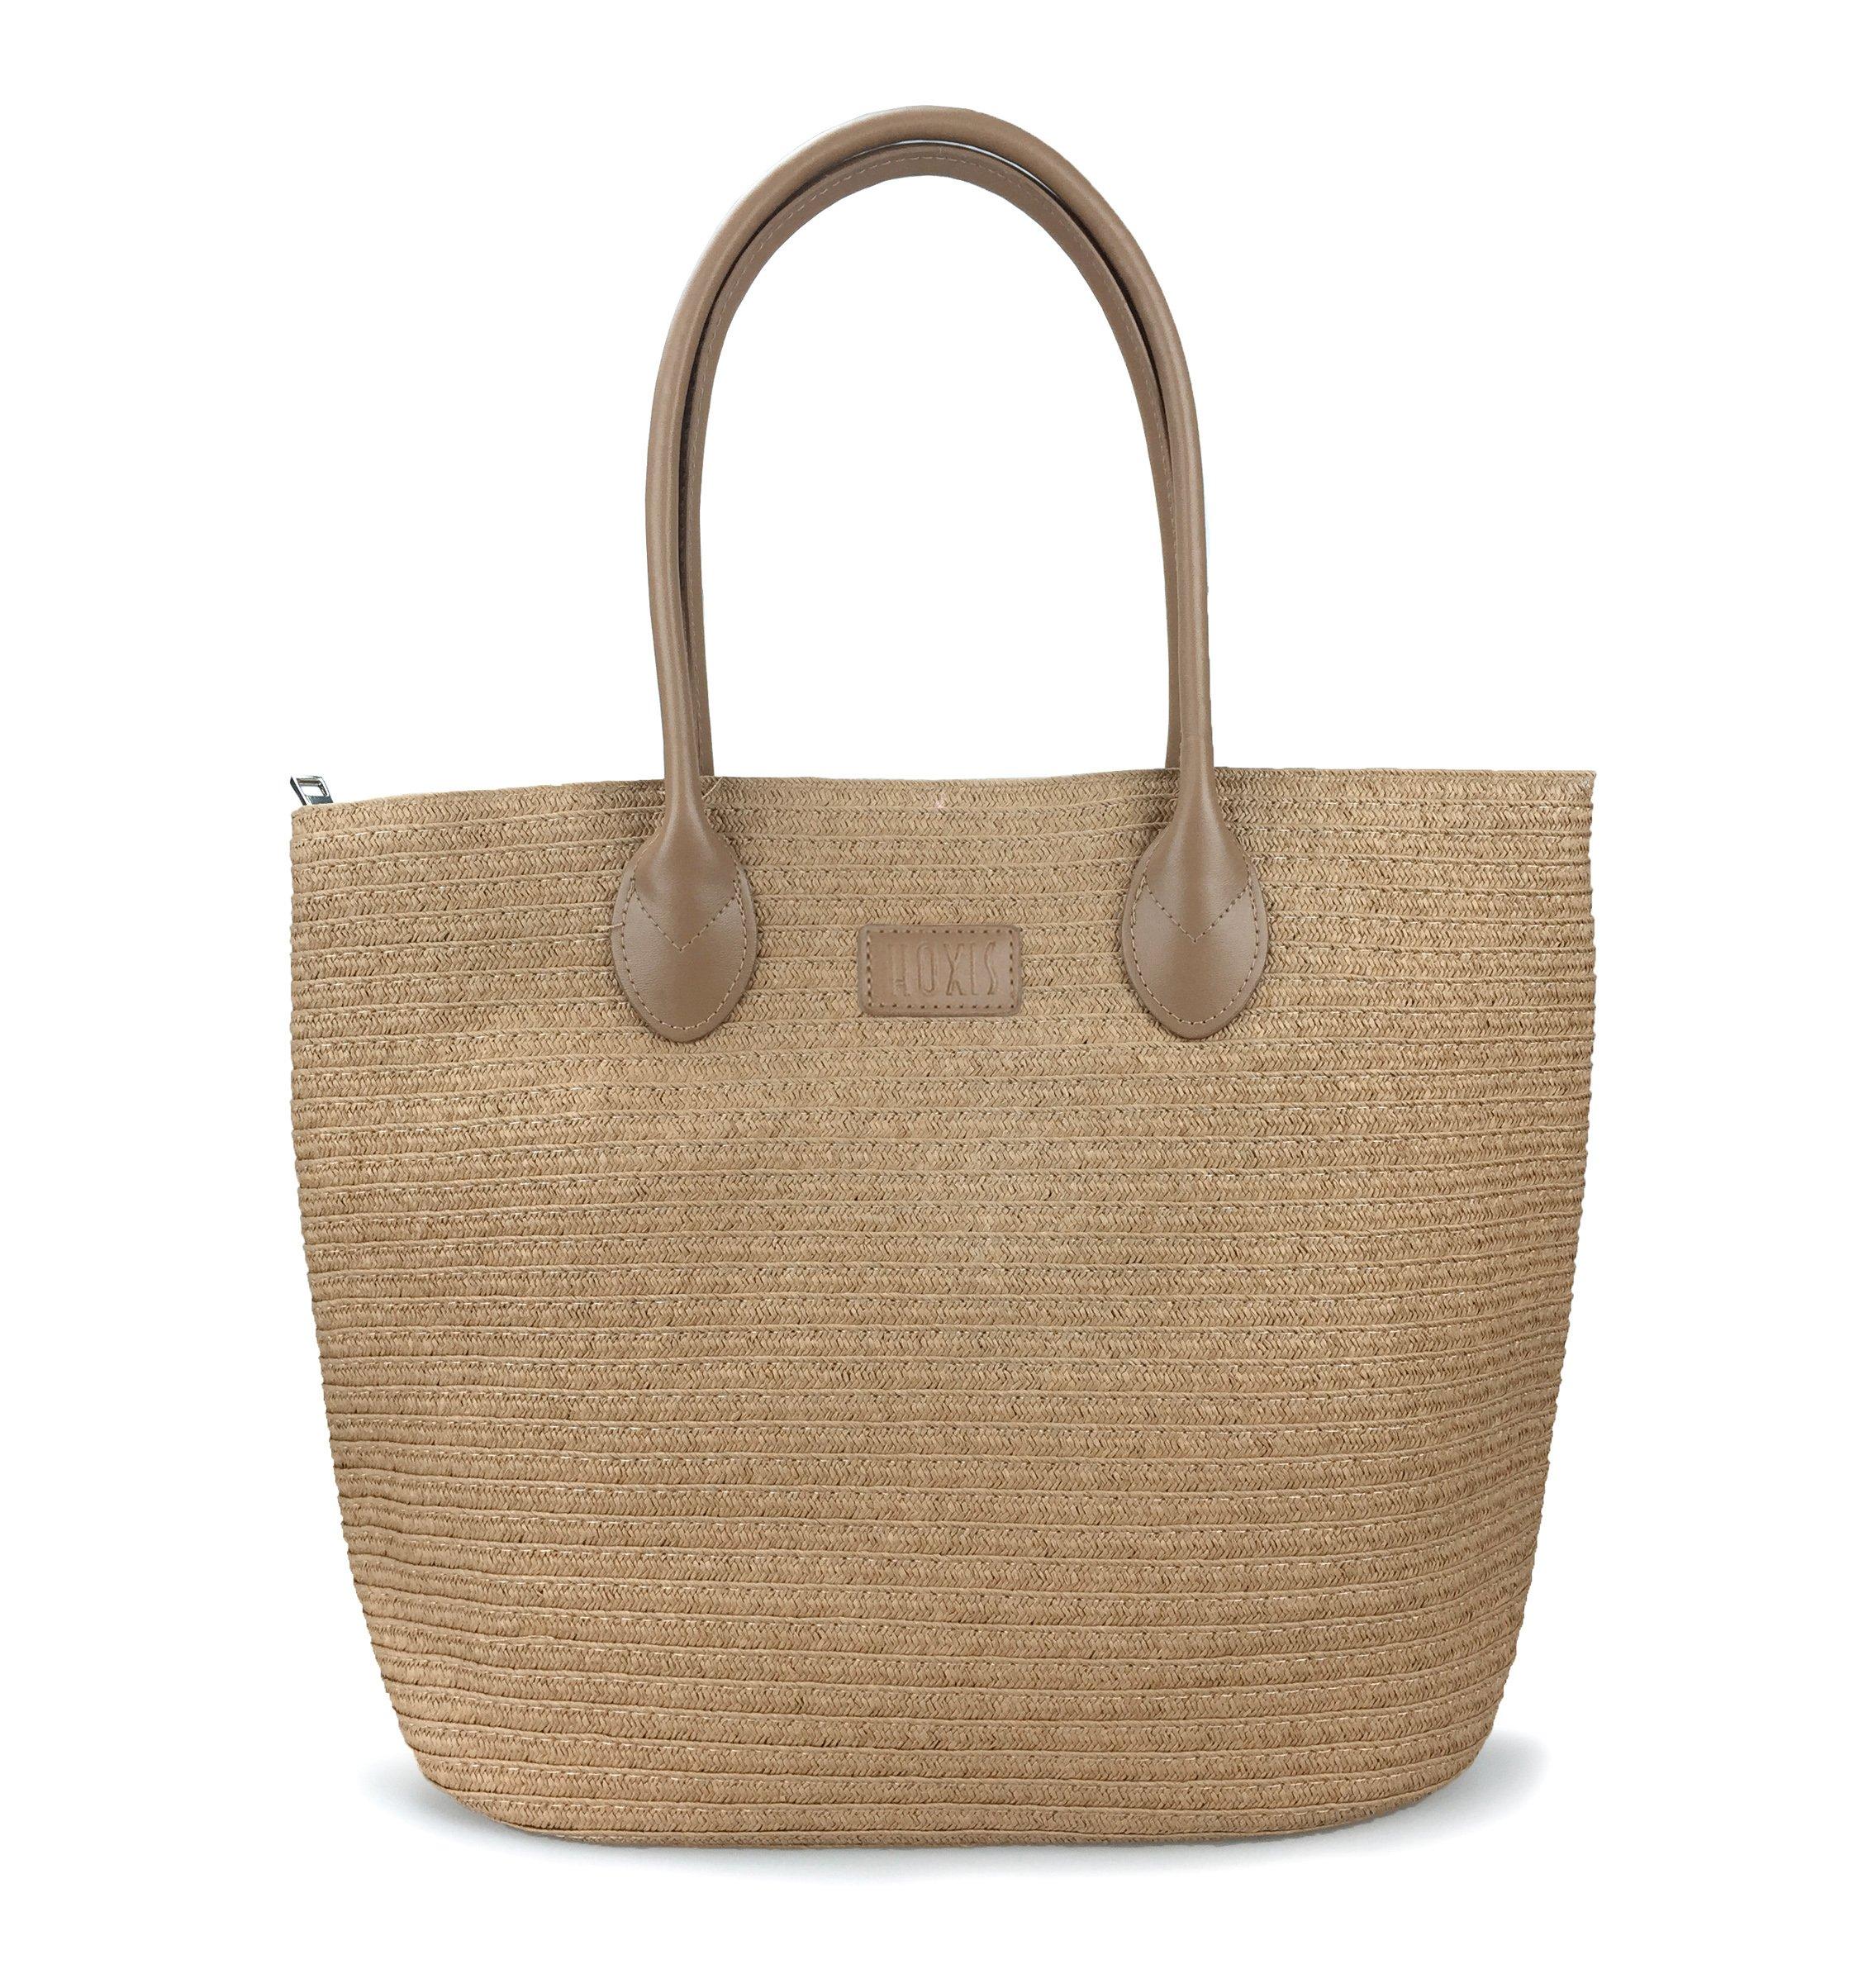 Straw Rattan Women Tote Summer Beach Shoulder Handbag Medium Size 17.8''x12.6''x5.1'' (Brown)